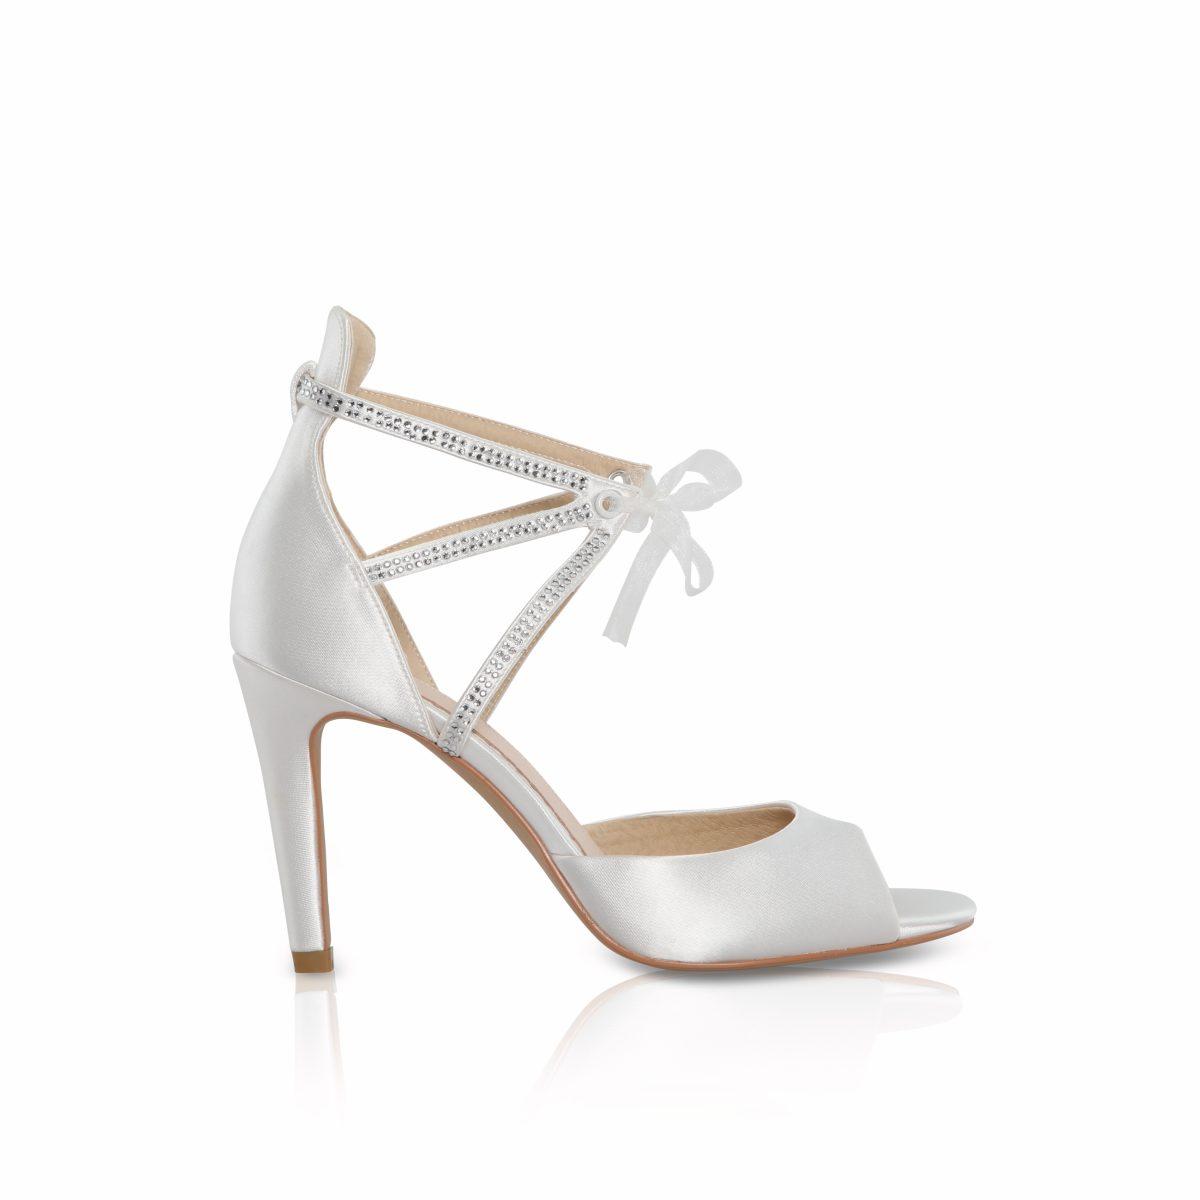 Perfect Bridal Kelis Shoes - Ivory Satin 1